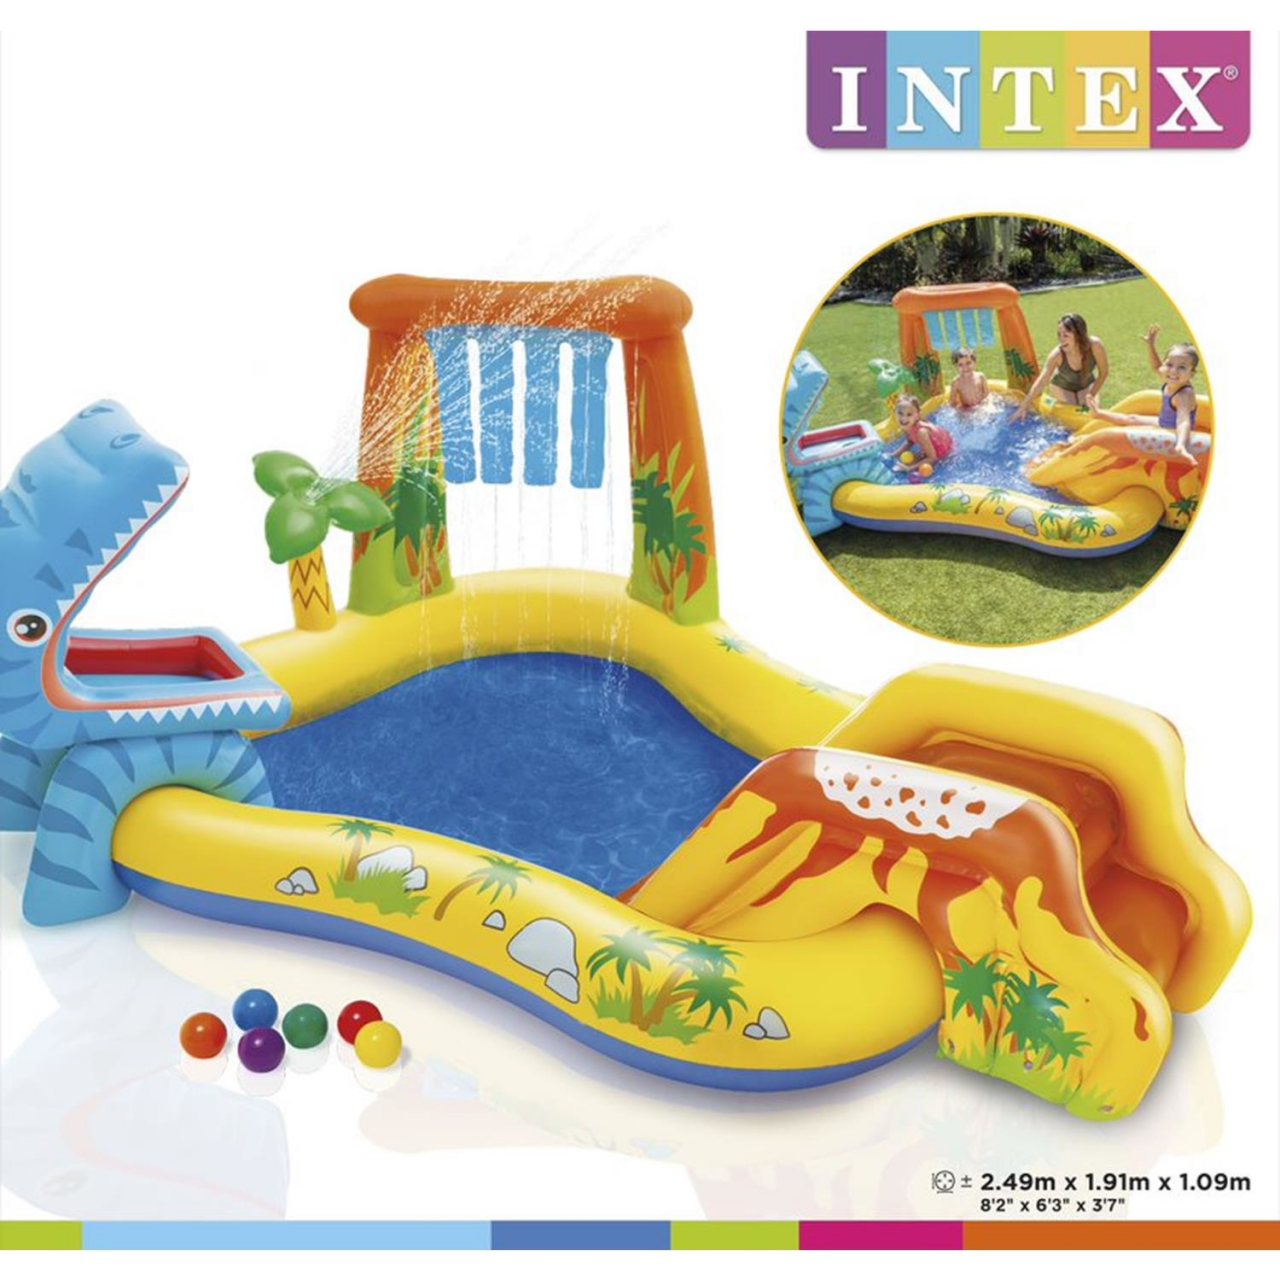 Intex Play Center Dino Planschbecken Pool Wasserrutsche Wasserfall aufblasbar